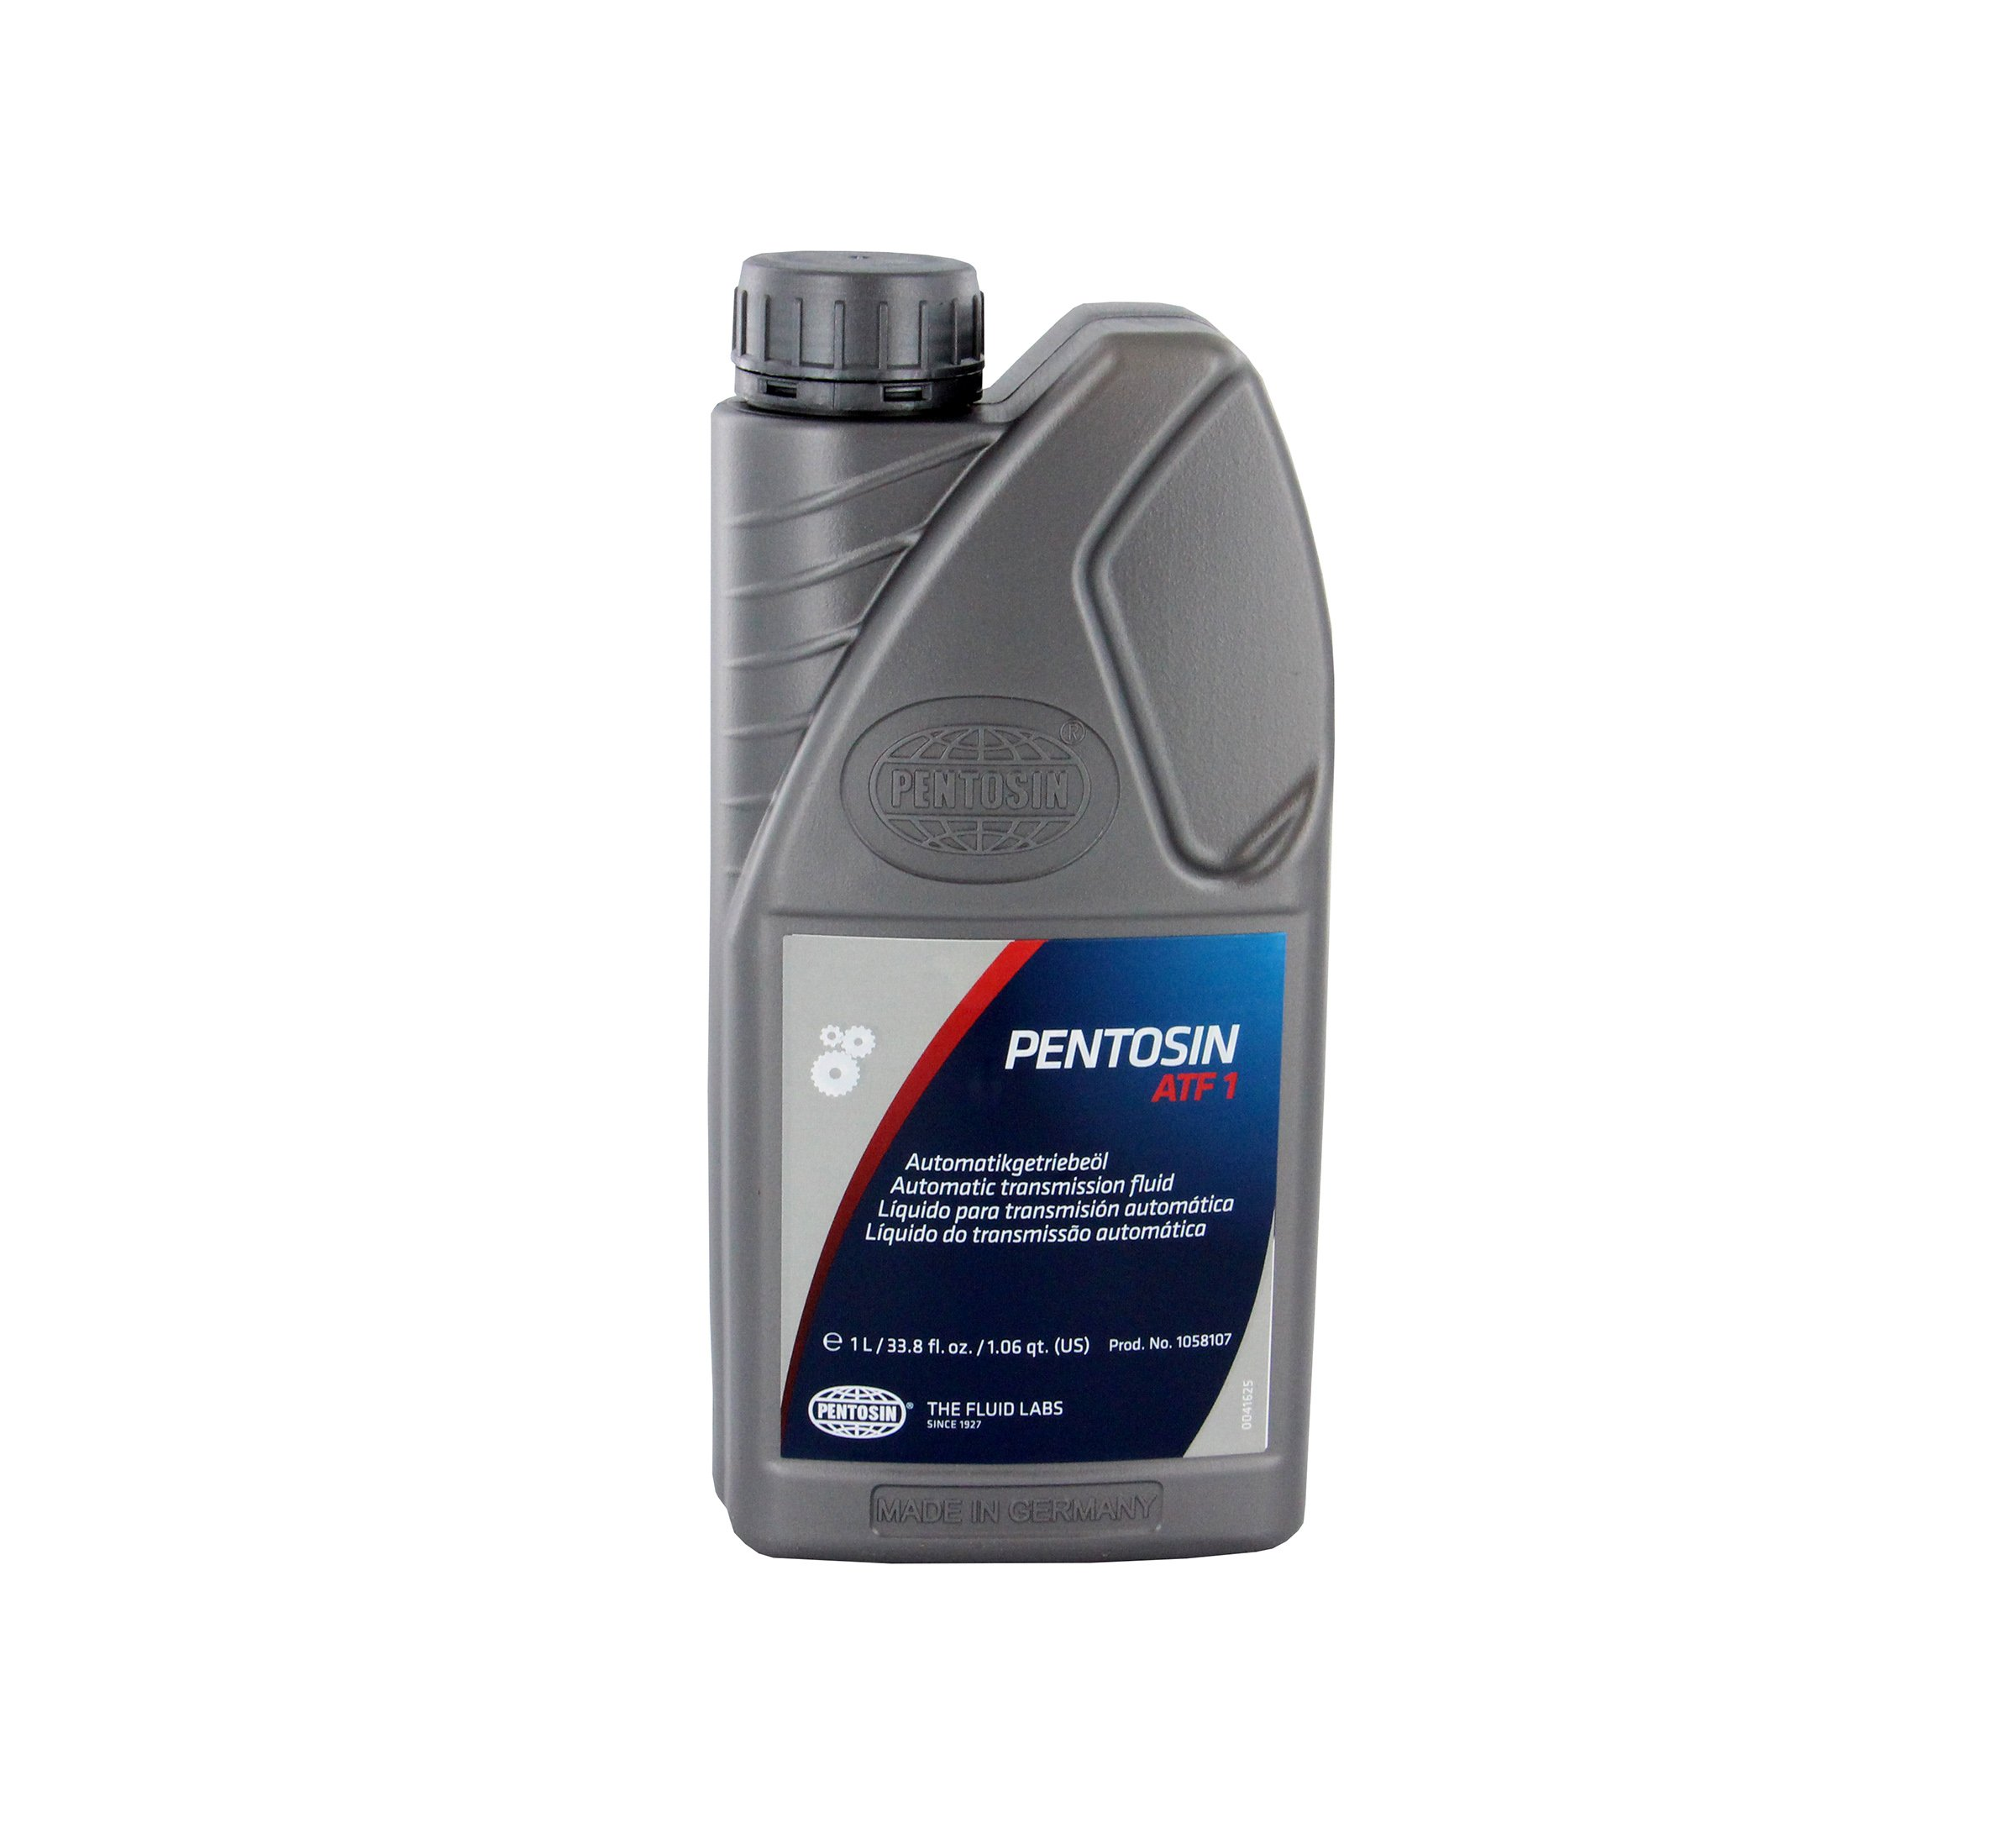 Pentosin 1058107 ATF-1 Synthetic AutomotiveTransmission Fluid, 1 Liter